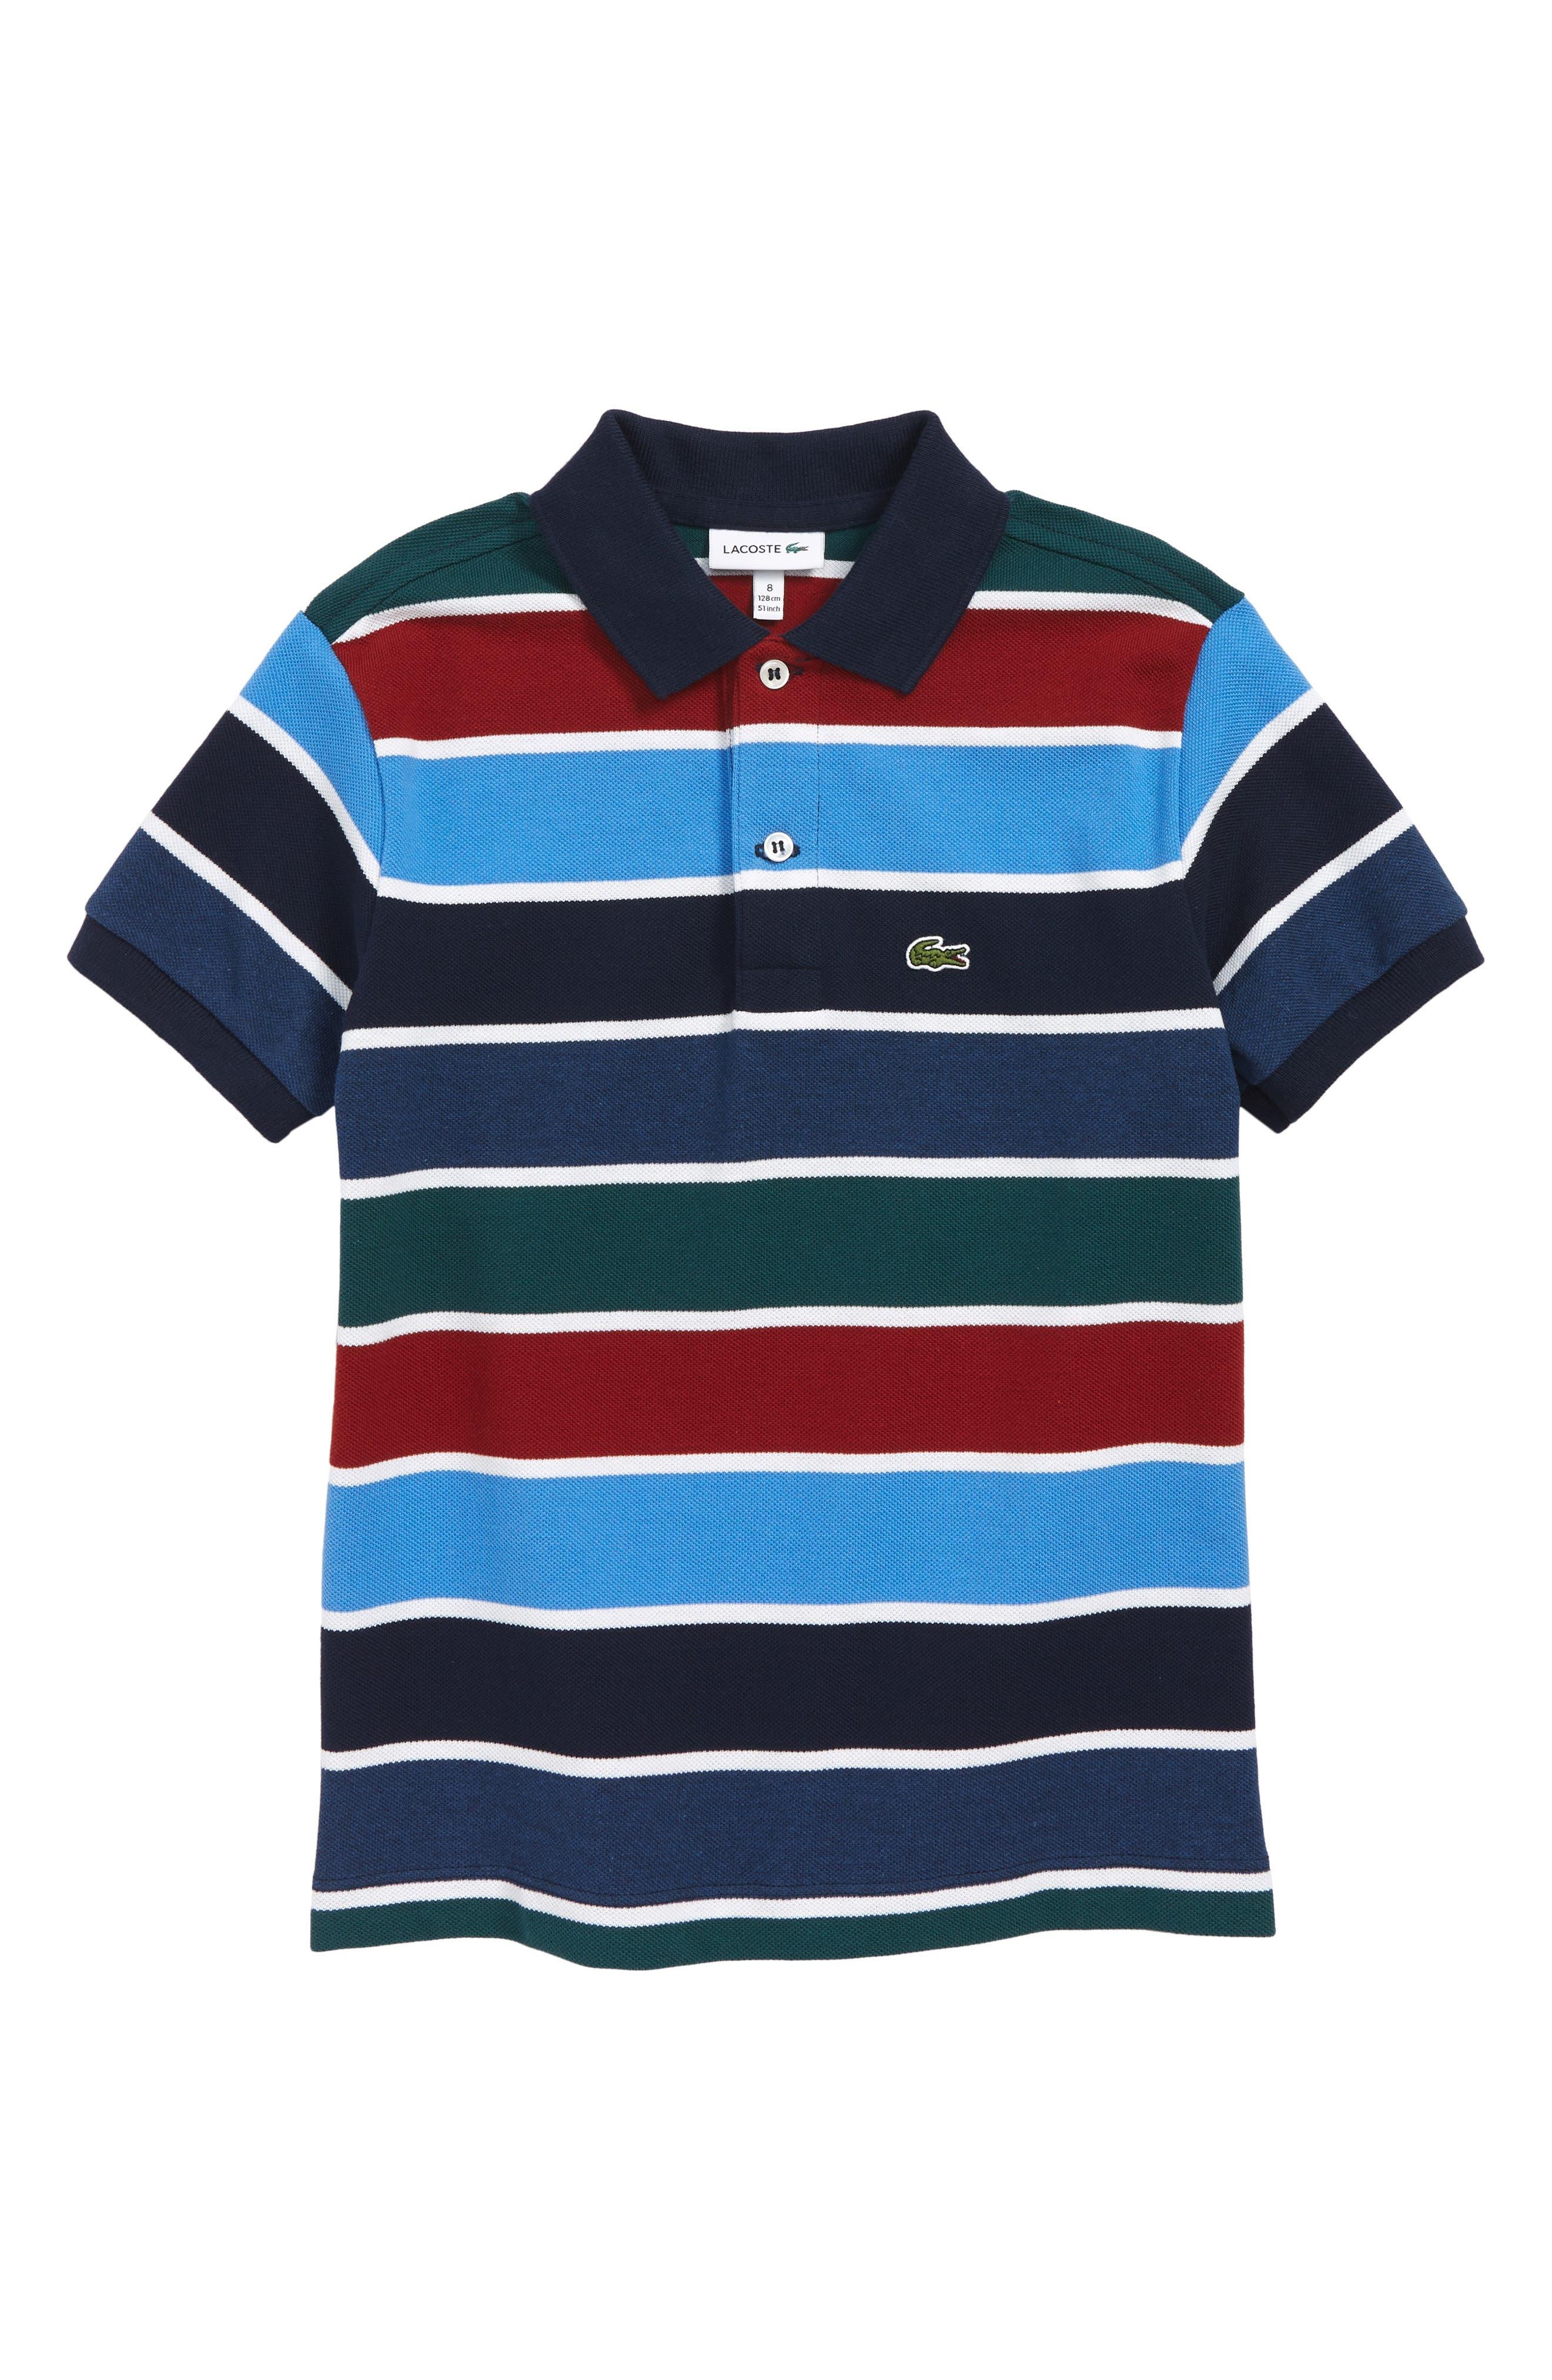 Toddler Boys Lacoste Multicolor Stripe Pique Polo Size 3Y  Blue